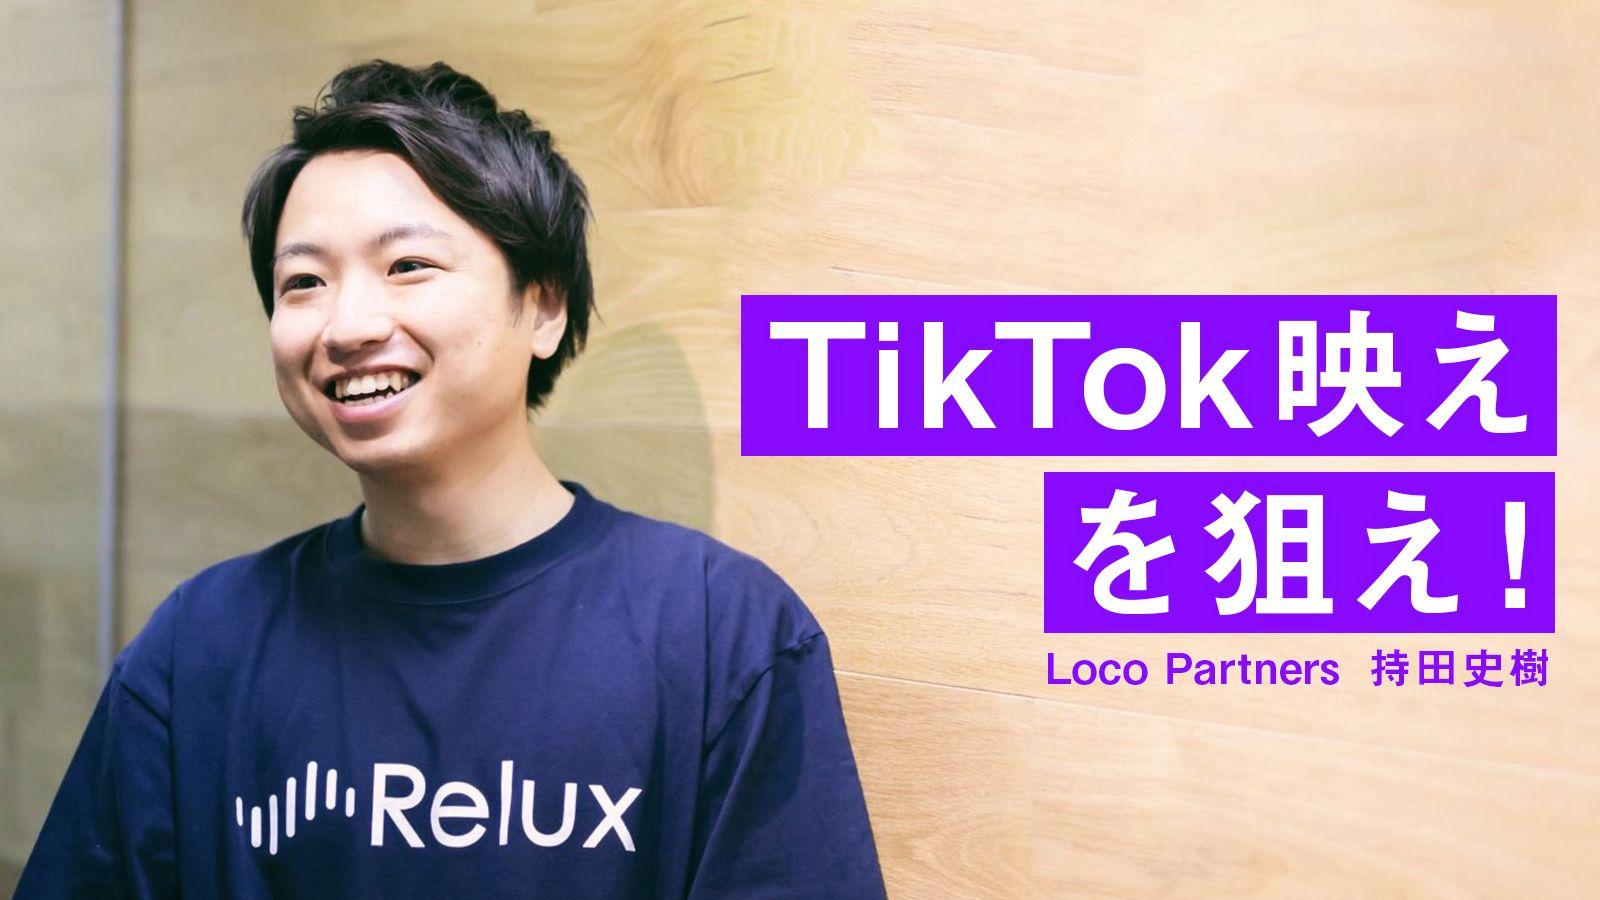 『Relux』に学ぶ、TikTok活用術! 2000万再生突破までにやったこと